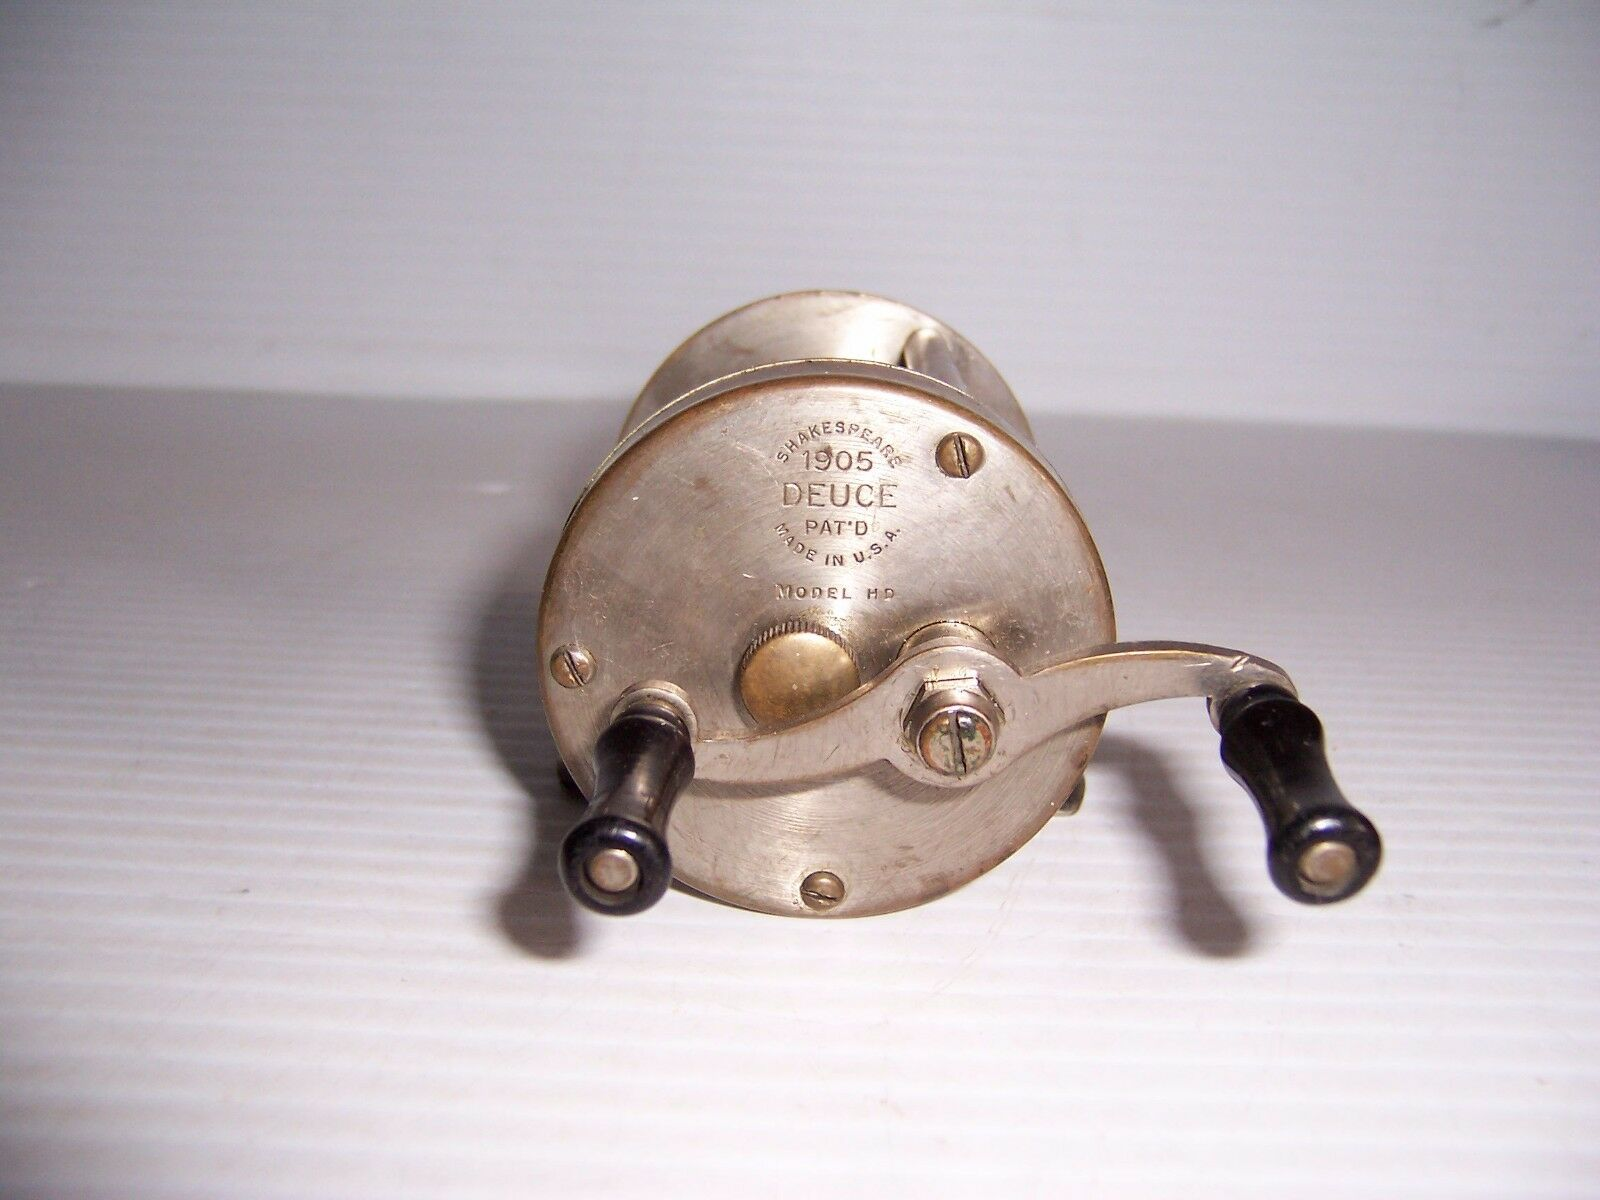 Vintage Shakespeare Deuce 1905 Model HD Fishing Reel